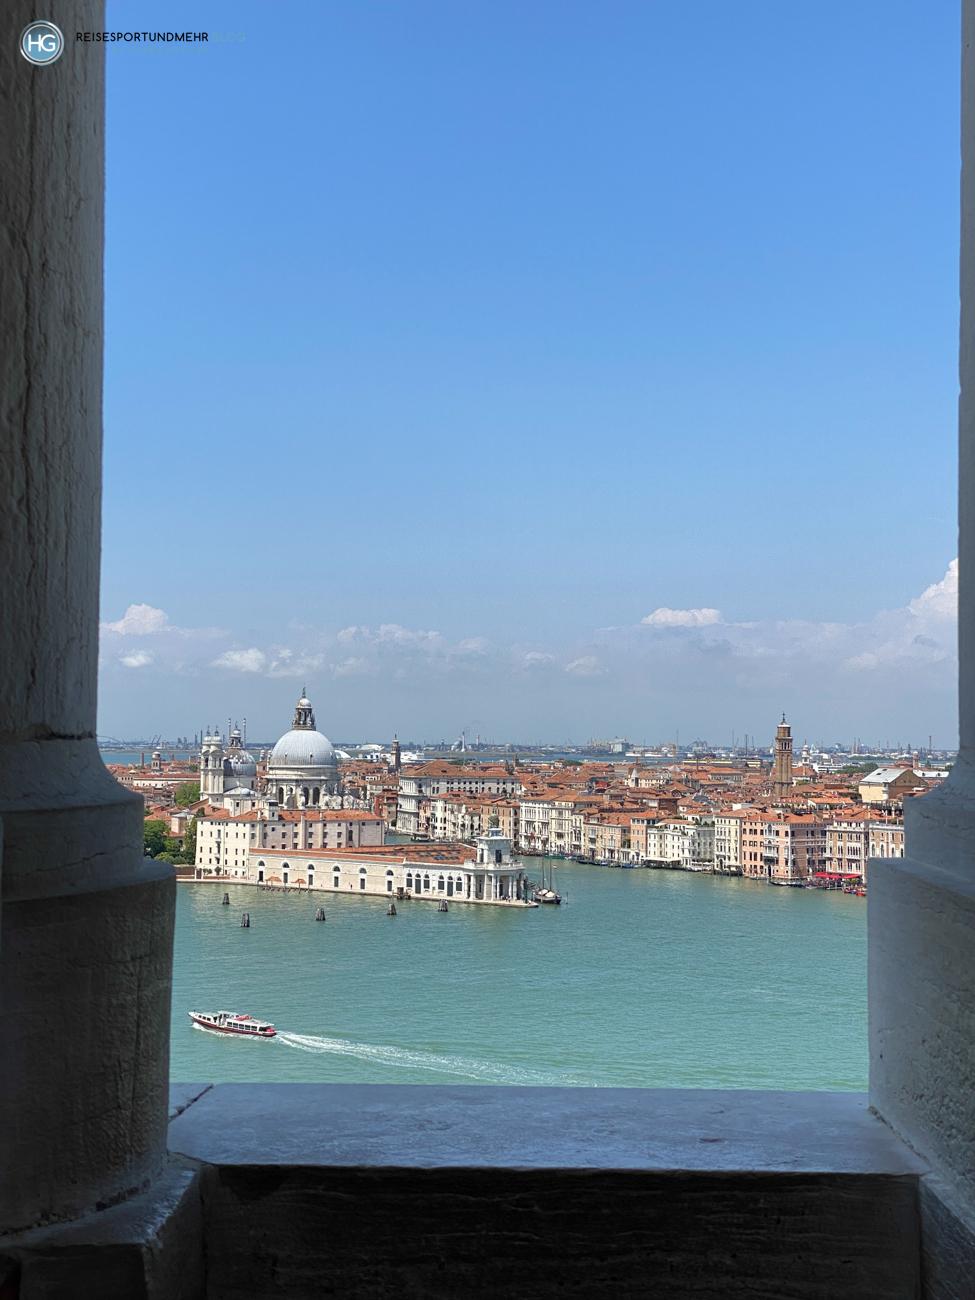 Venedig Pfingsten 2021 - wunderbare Aussicht vom Glockenturm San Giorgio Richtung Santa Maria della Salute (Foto: Hanns Gröner)